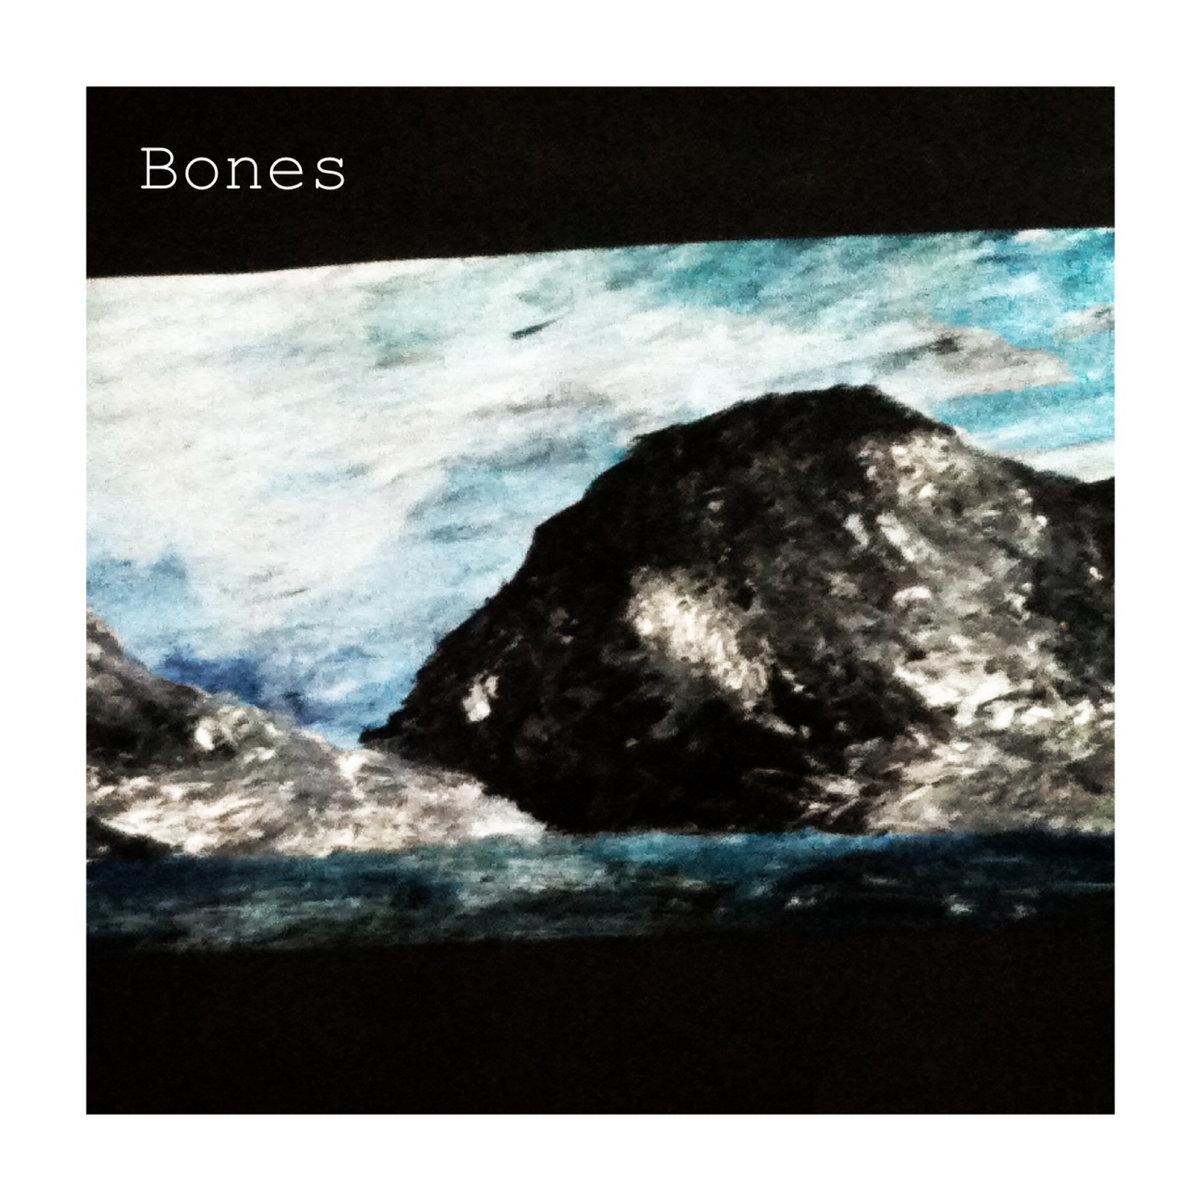 Bones - Single | Hannah Waddelow